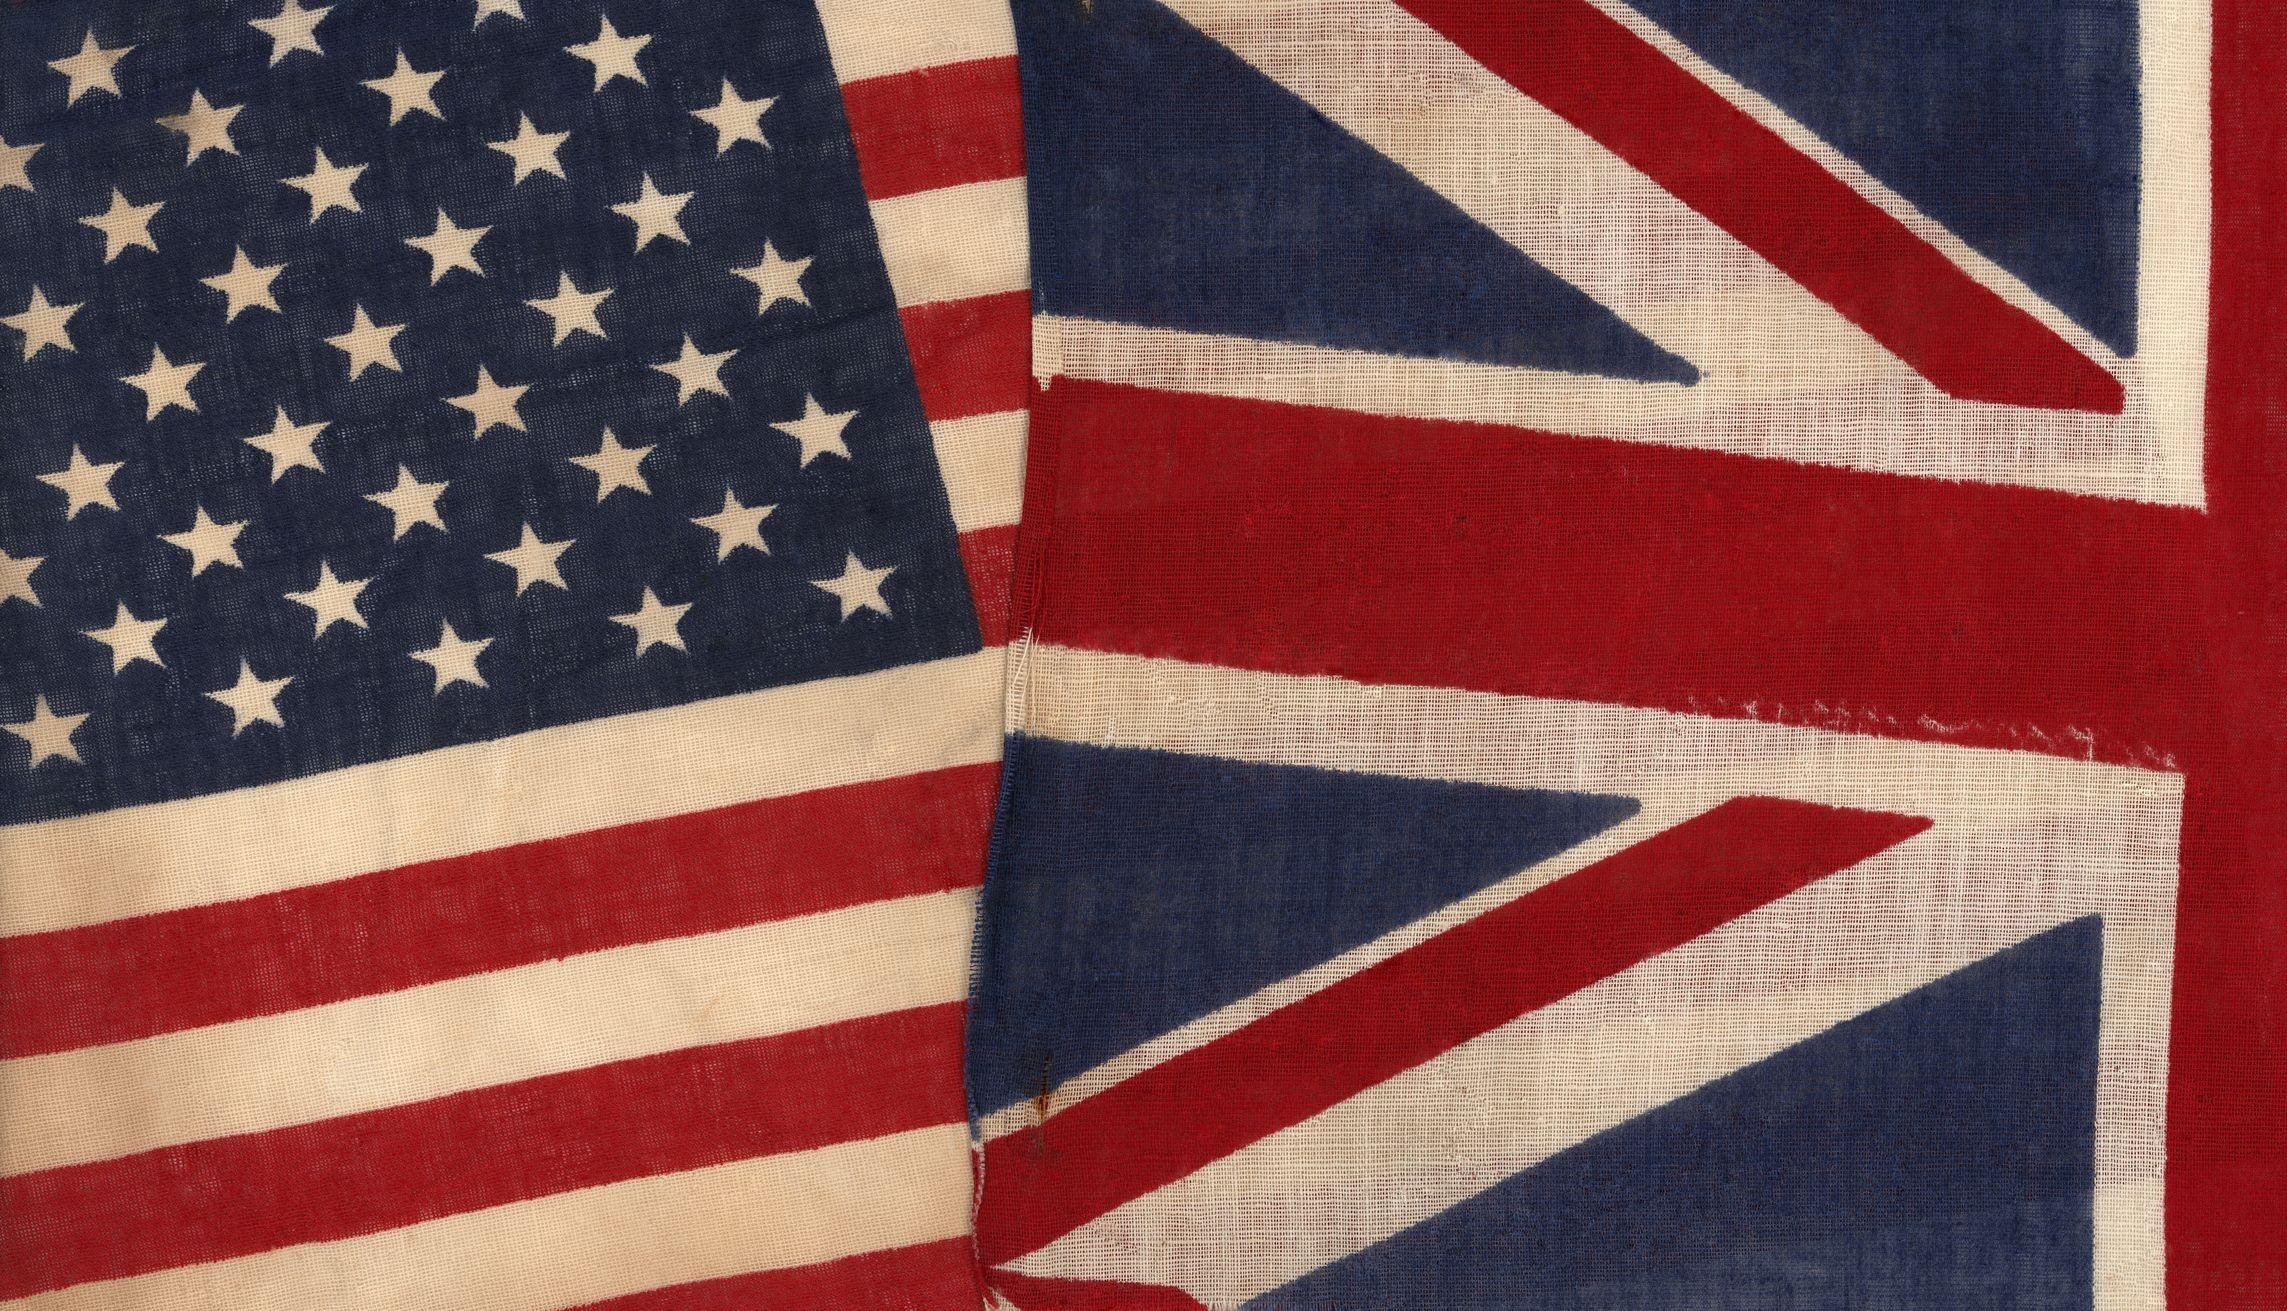 vintage american flag background download free high resolution